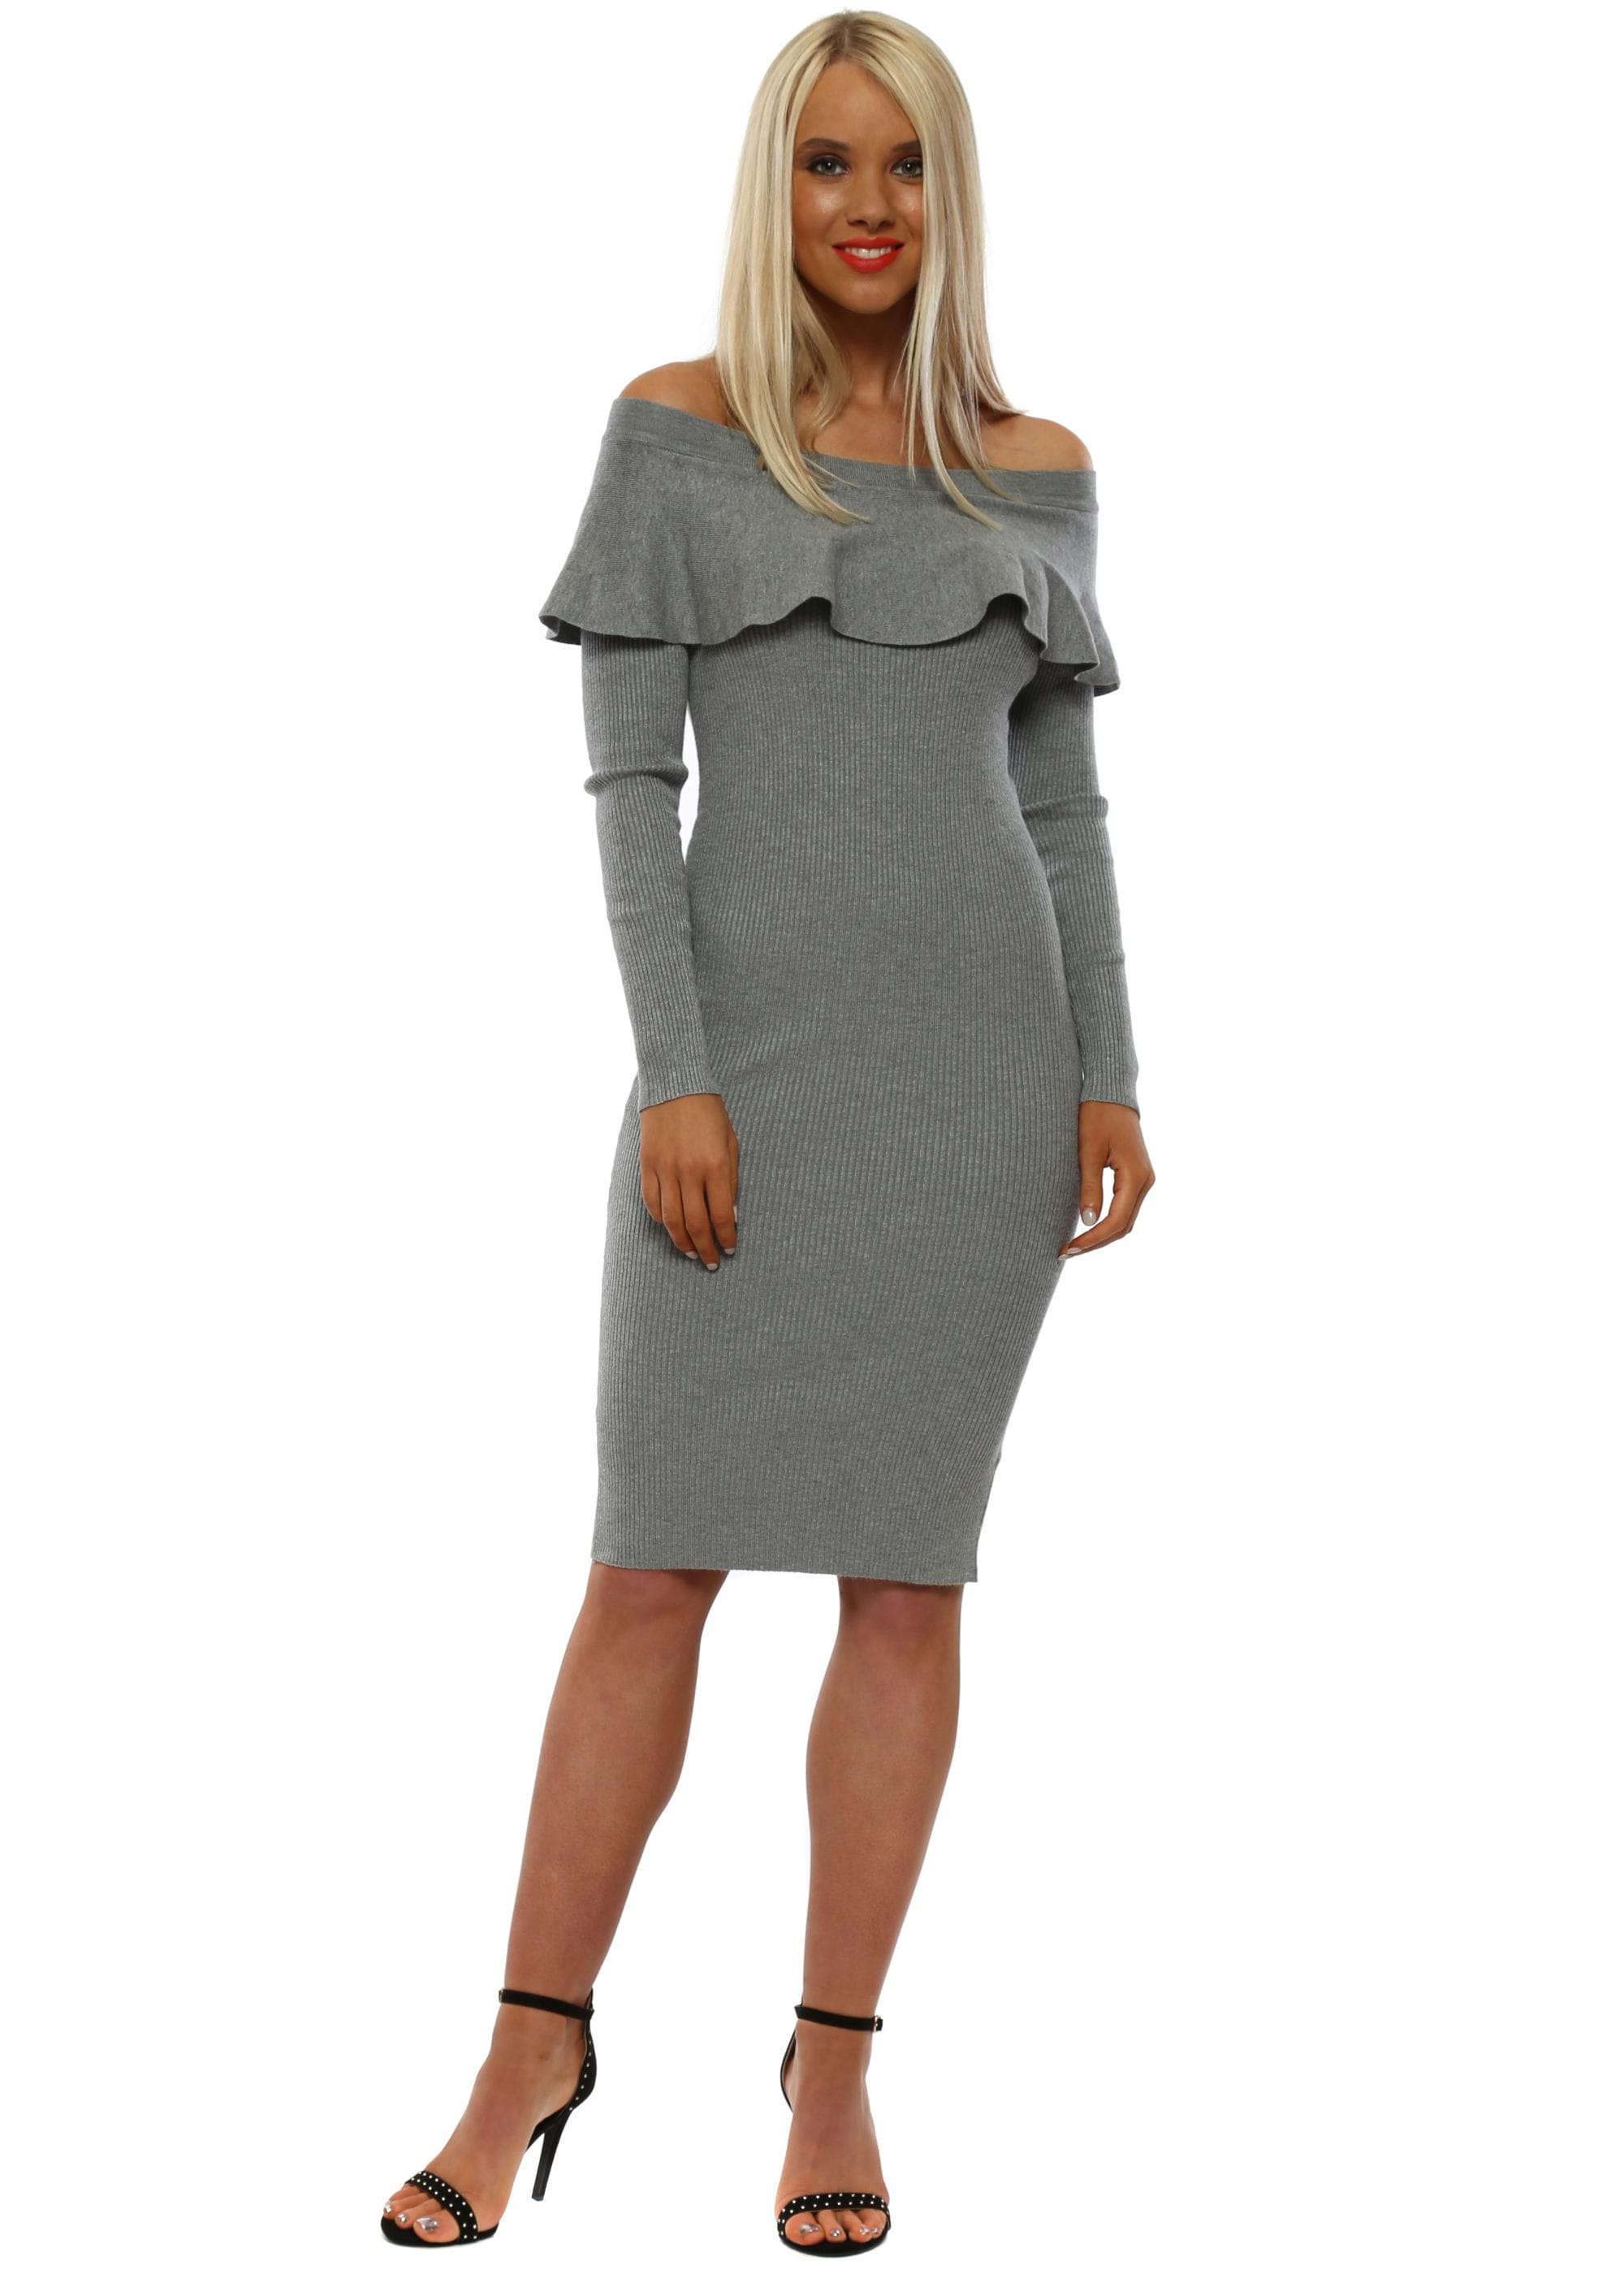 a35b0aa71f4 Grey Off The Shoulder Long Sleeved Jumper Dress